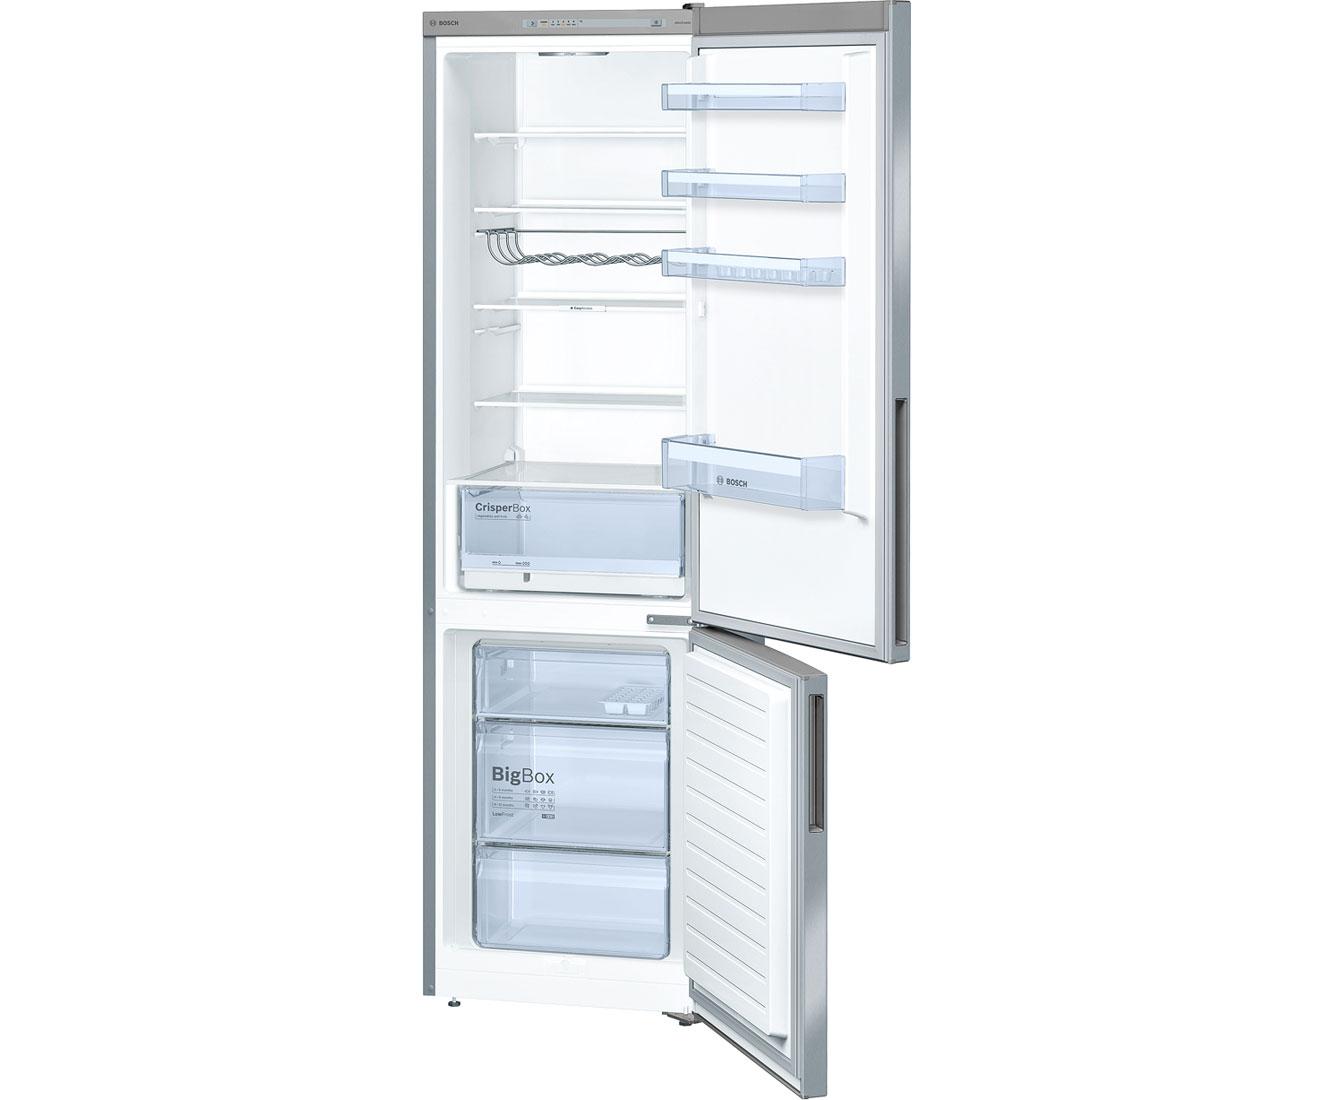 Bosch Kühlschrank Crisper Box : Bosch serie 4 kgv39vi31 kühl gefrierkombination 60er breite